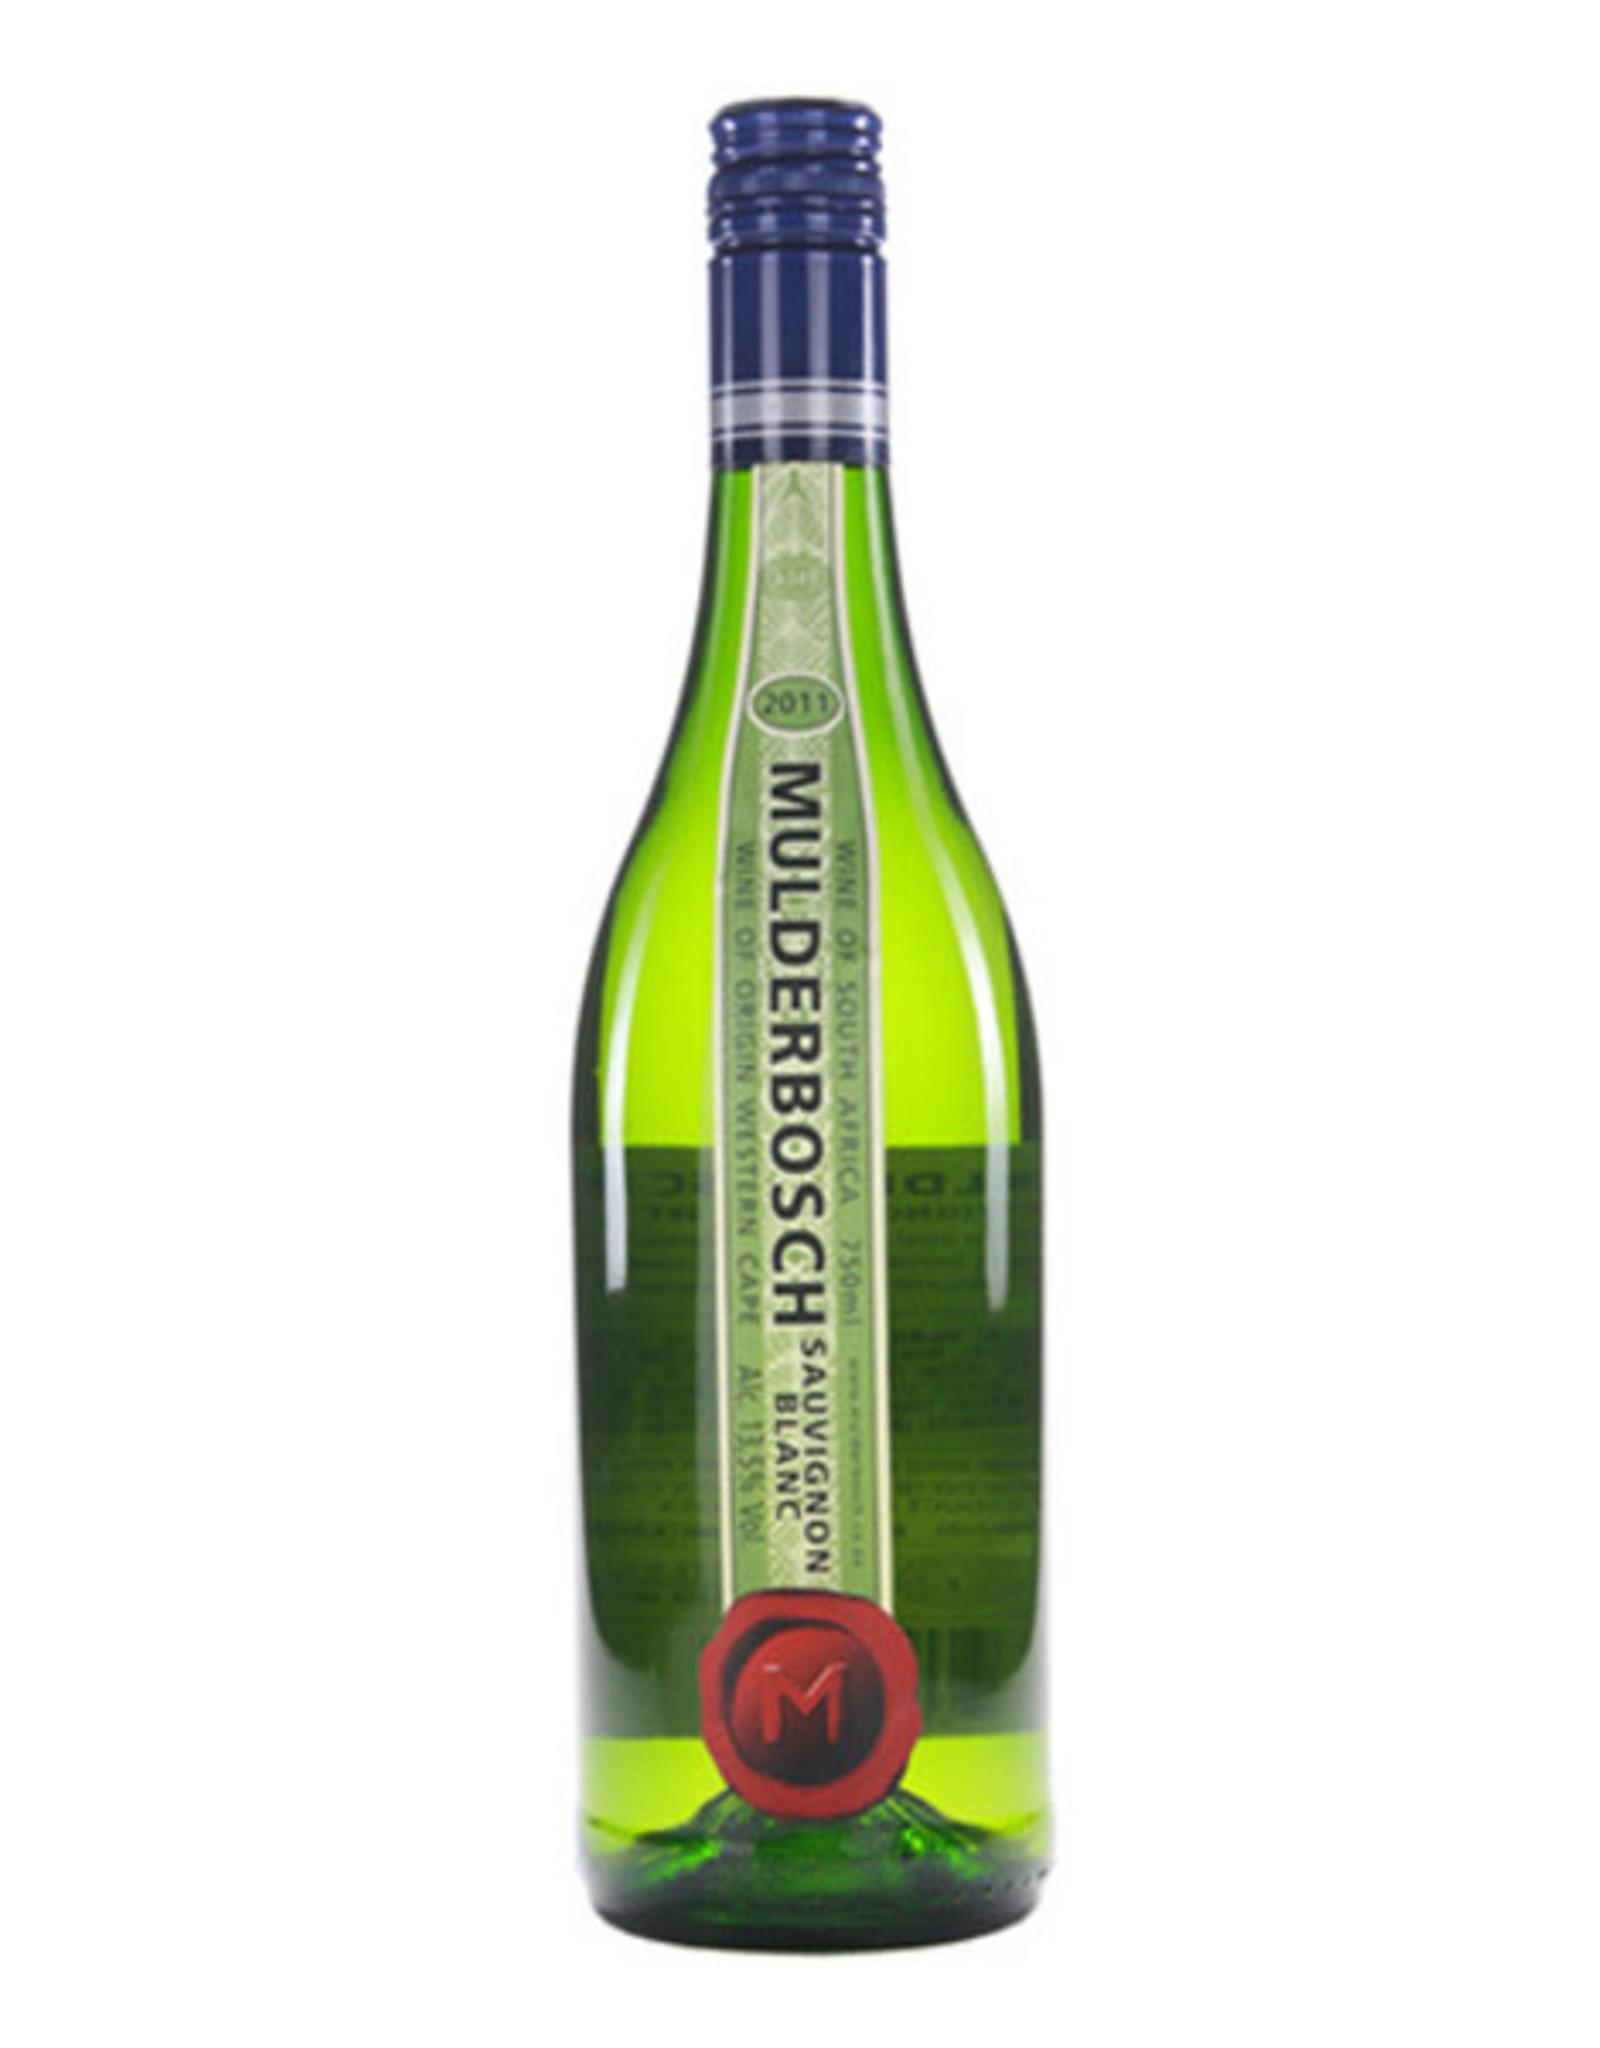 Mulderbosch Sauvignon Blanc